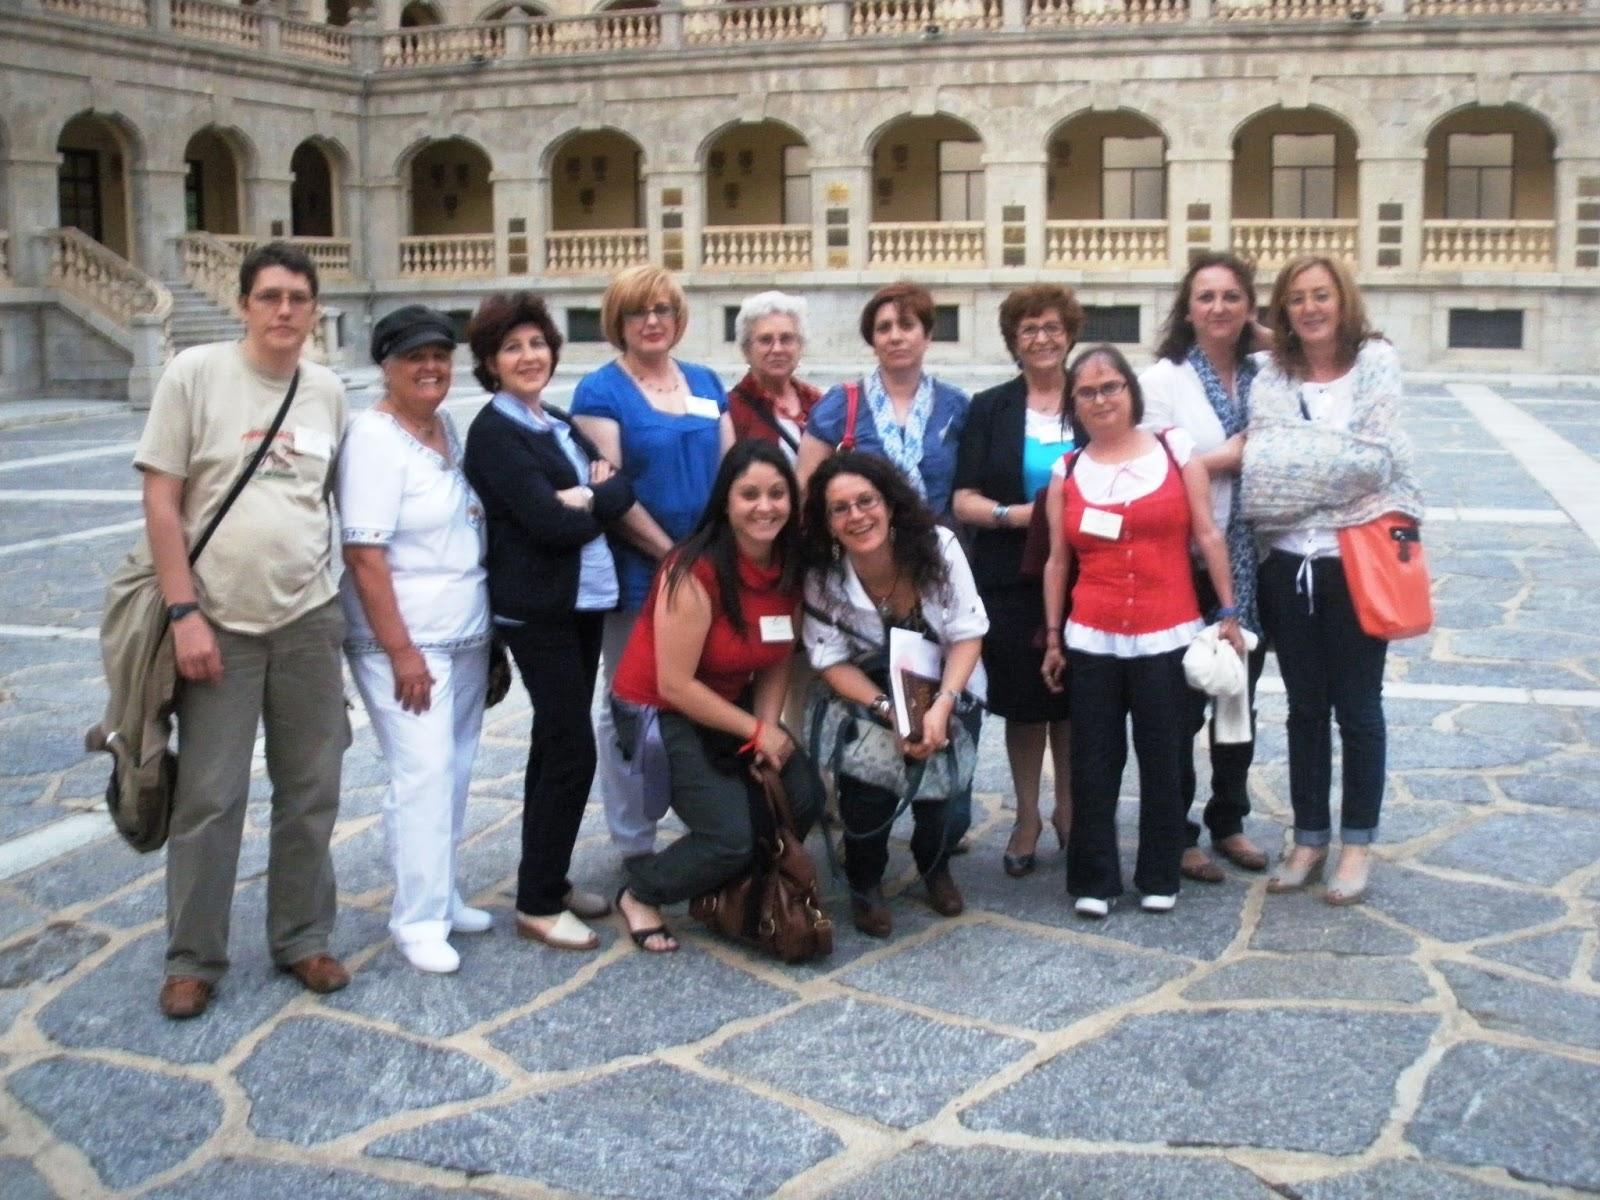 Con MATILDE ASENSI, Toledo, 9 de JUNIO DE 2011